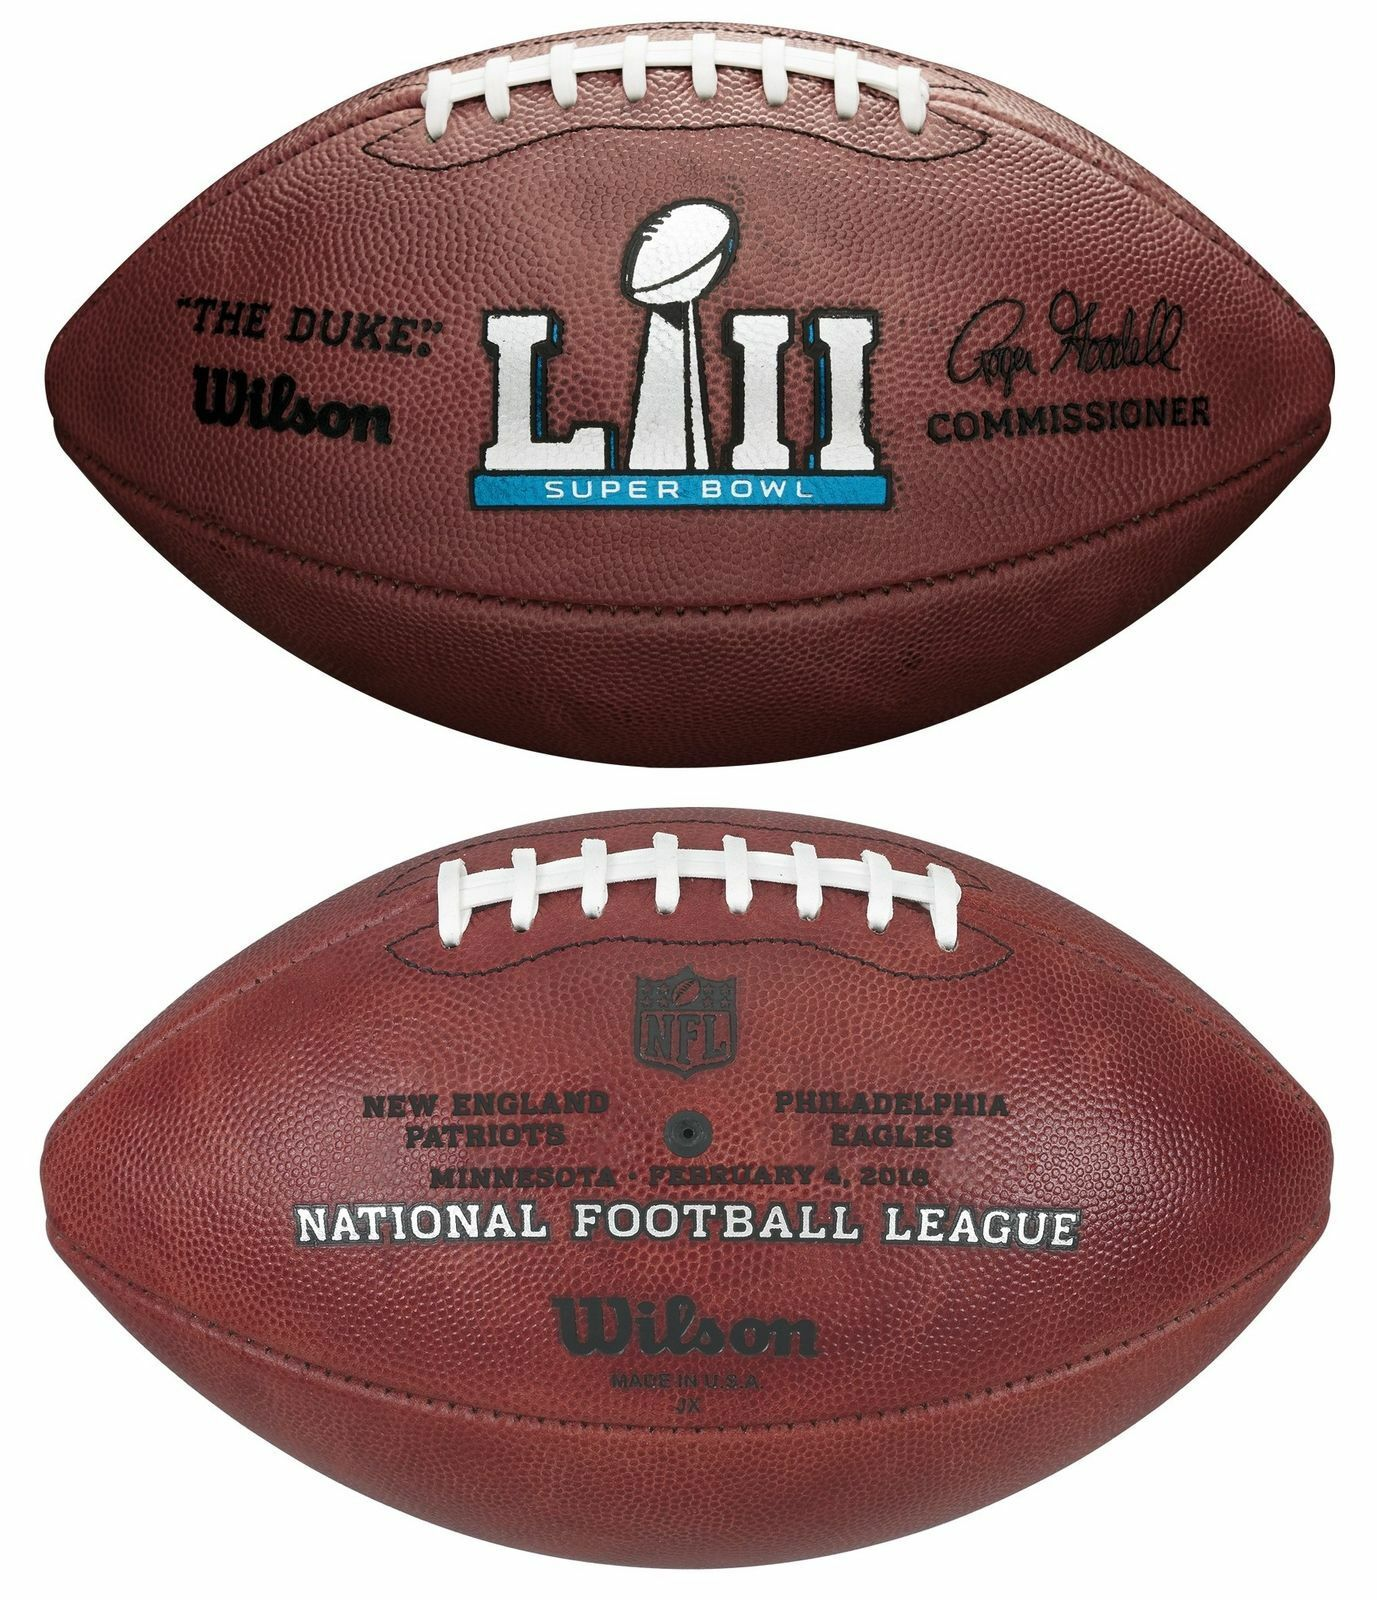 Купить Wilson - NFL Super Bowl 52 Authentic Wilson Game Football w/ Eagles & Patriots Inscribed